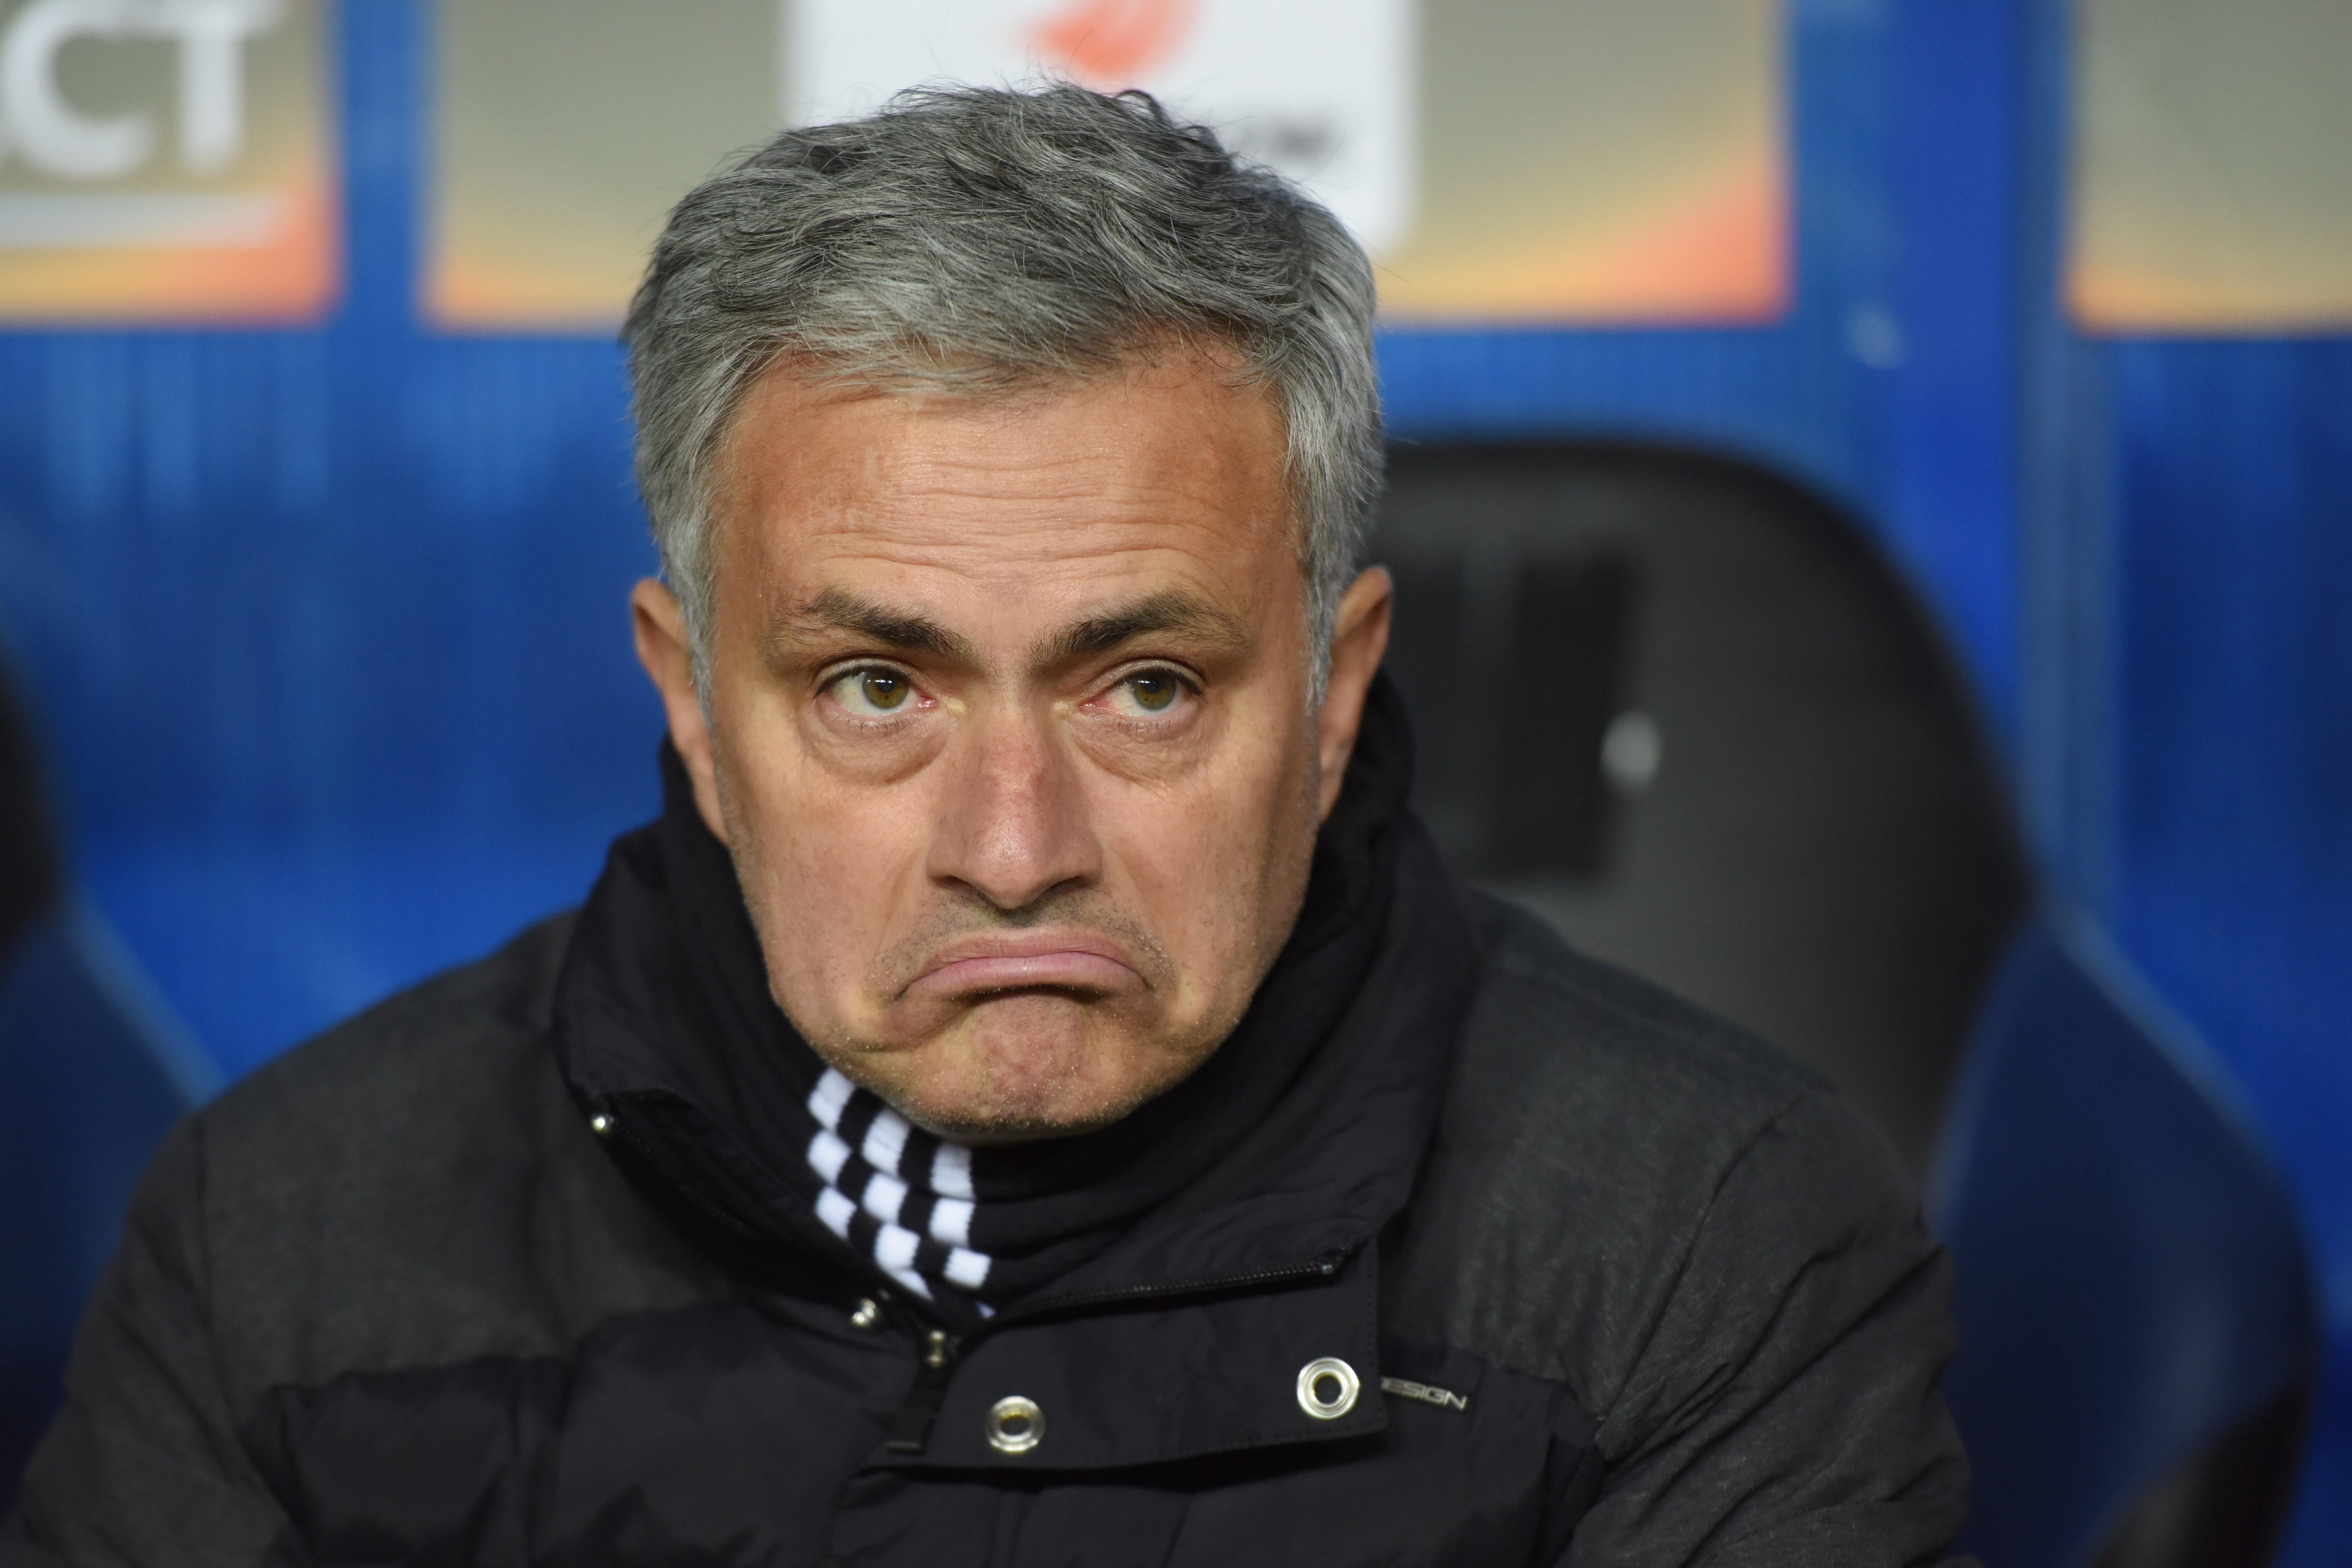 Southampton slap £15million price tag on Jose Fonte to discourage Manchester United interest